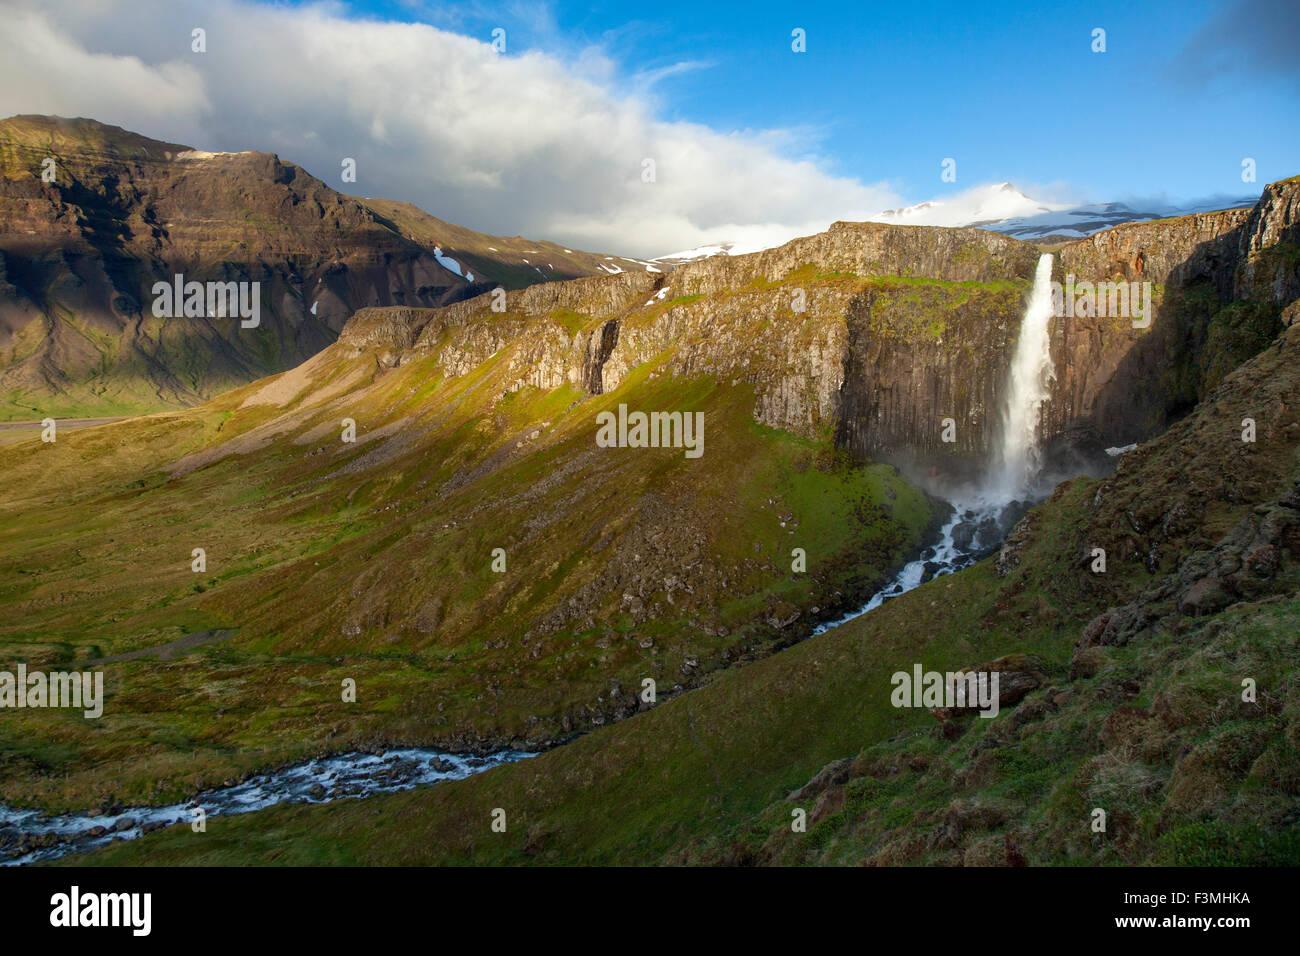 Berg-Wasserfall in der Nähe von Grundarfjordur, Snaefellsnes Halbinsel, Vesturland, Island. Stockbild